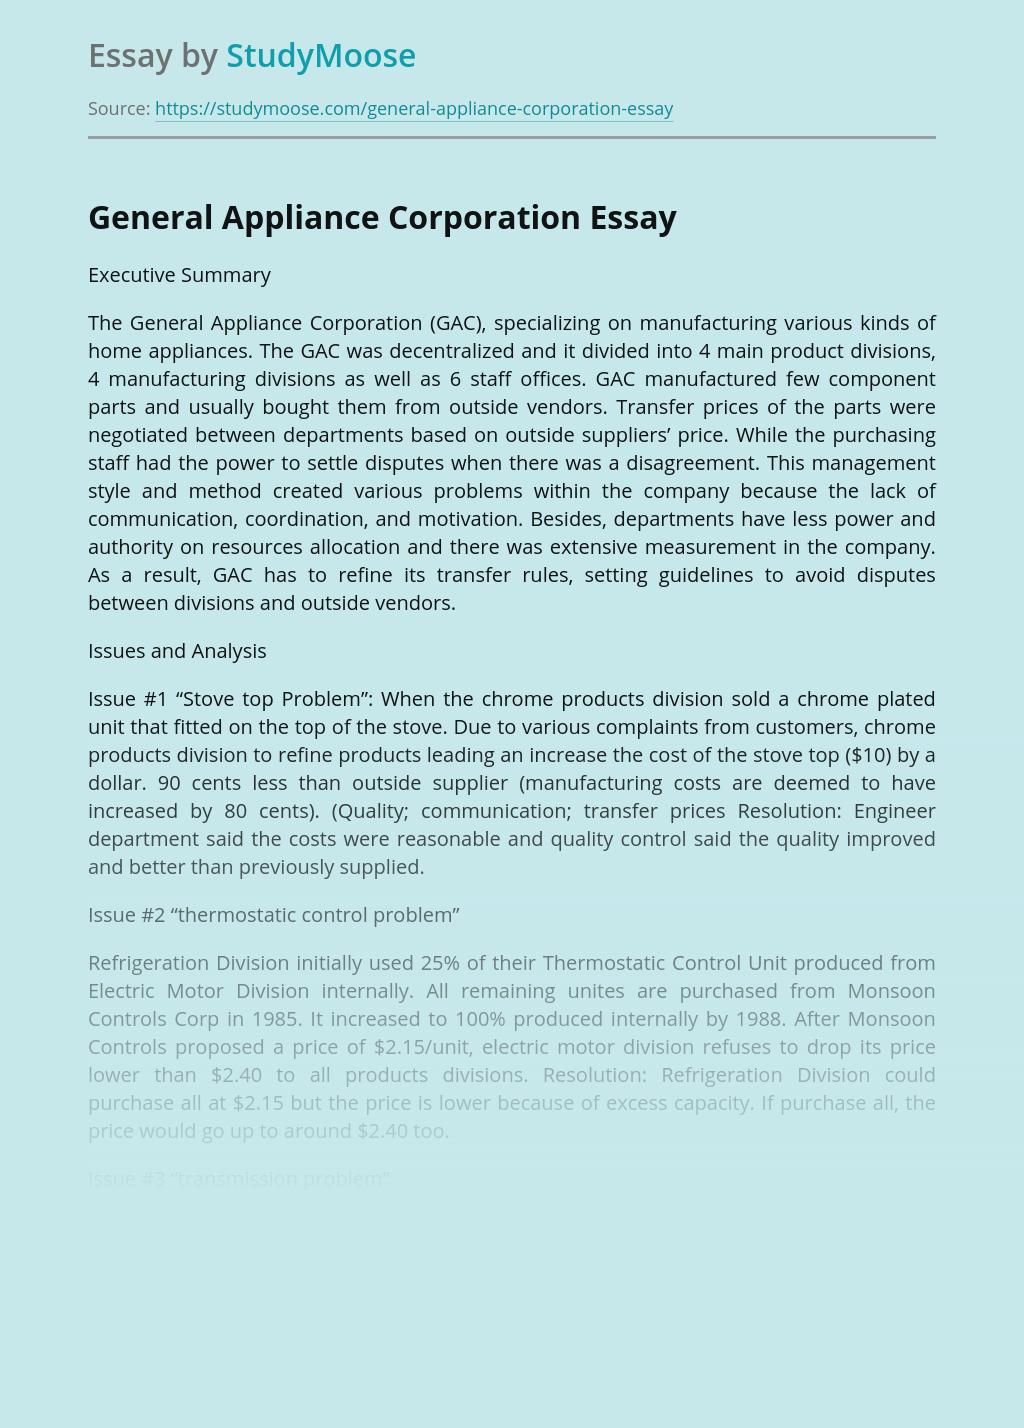 General Appliance Corporation